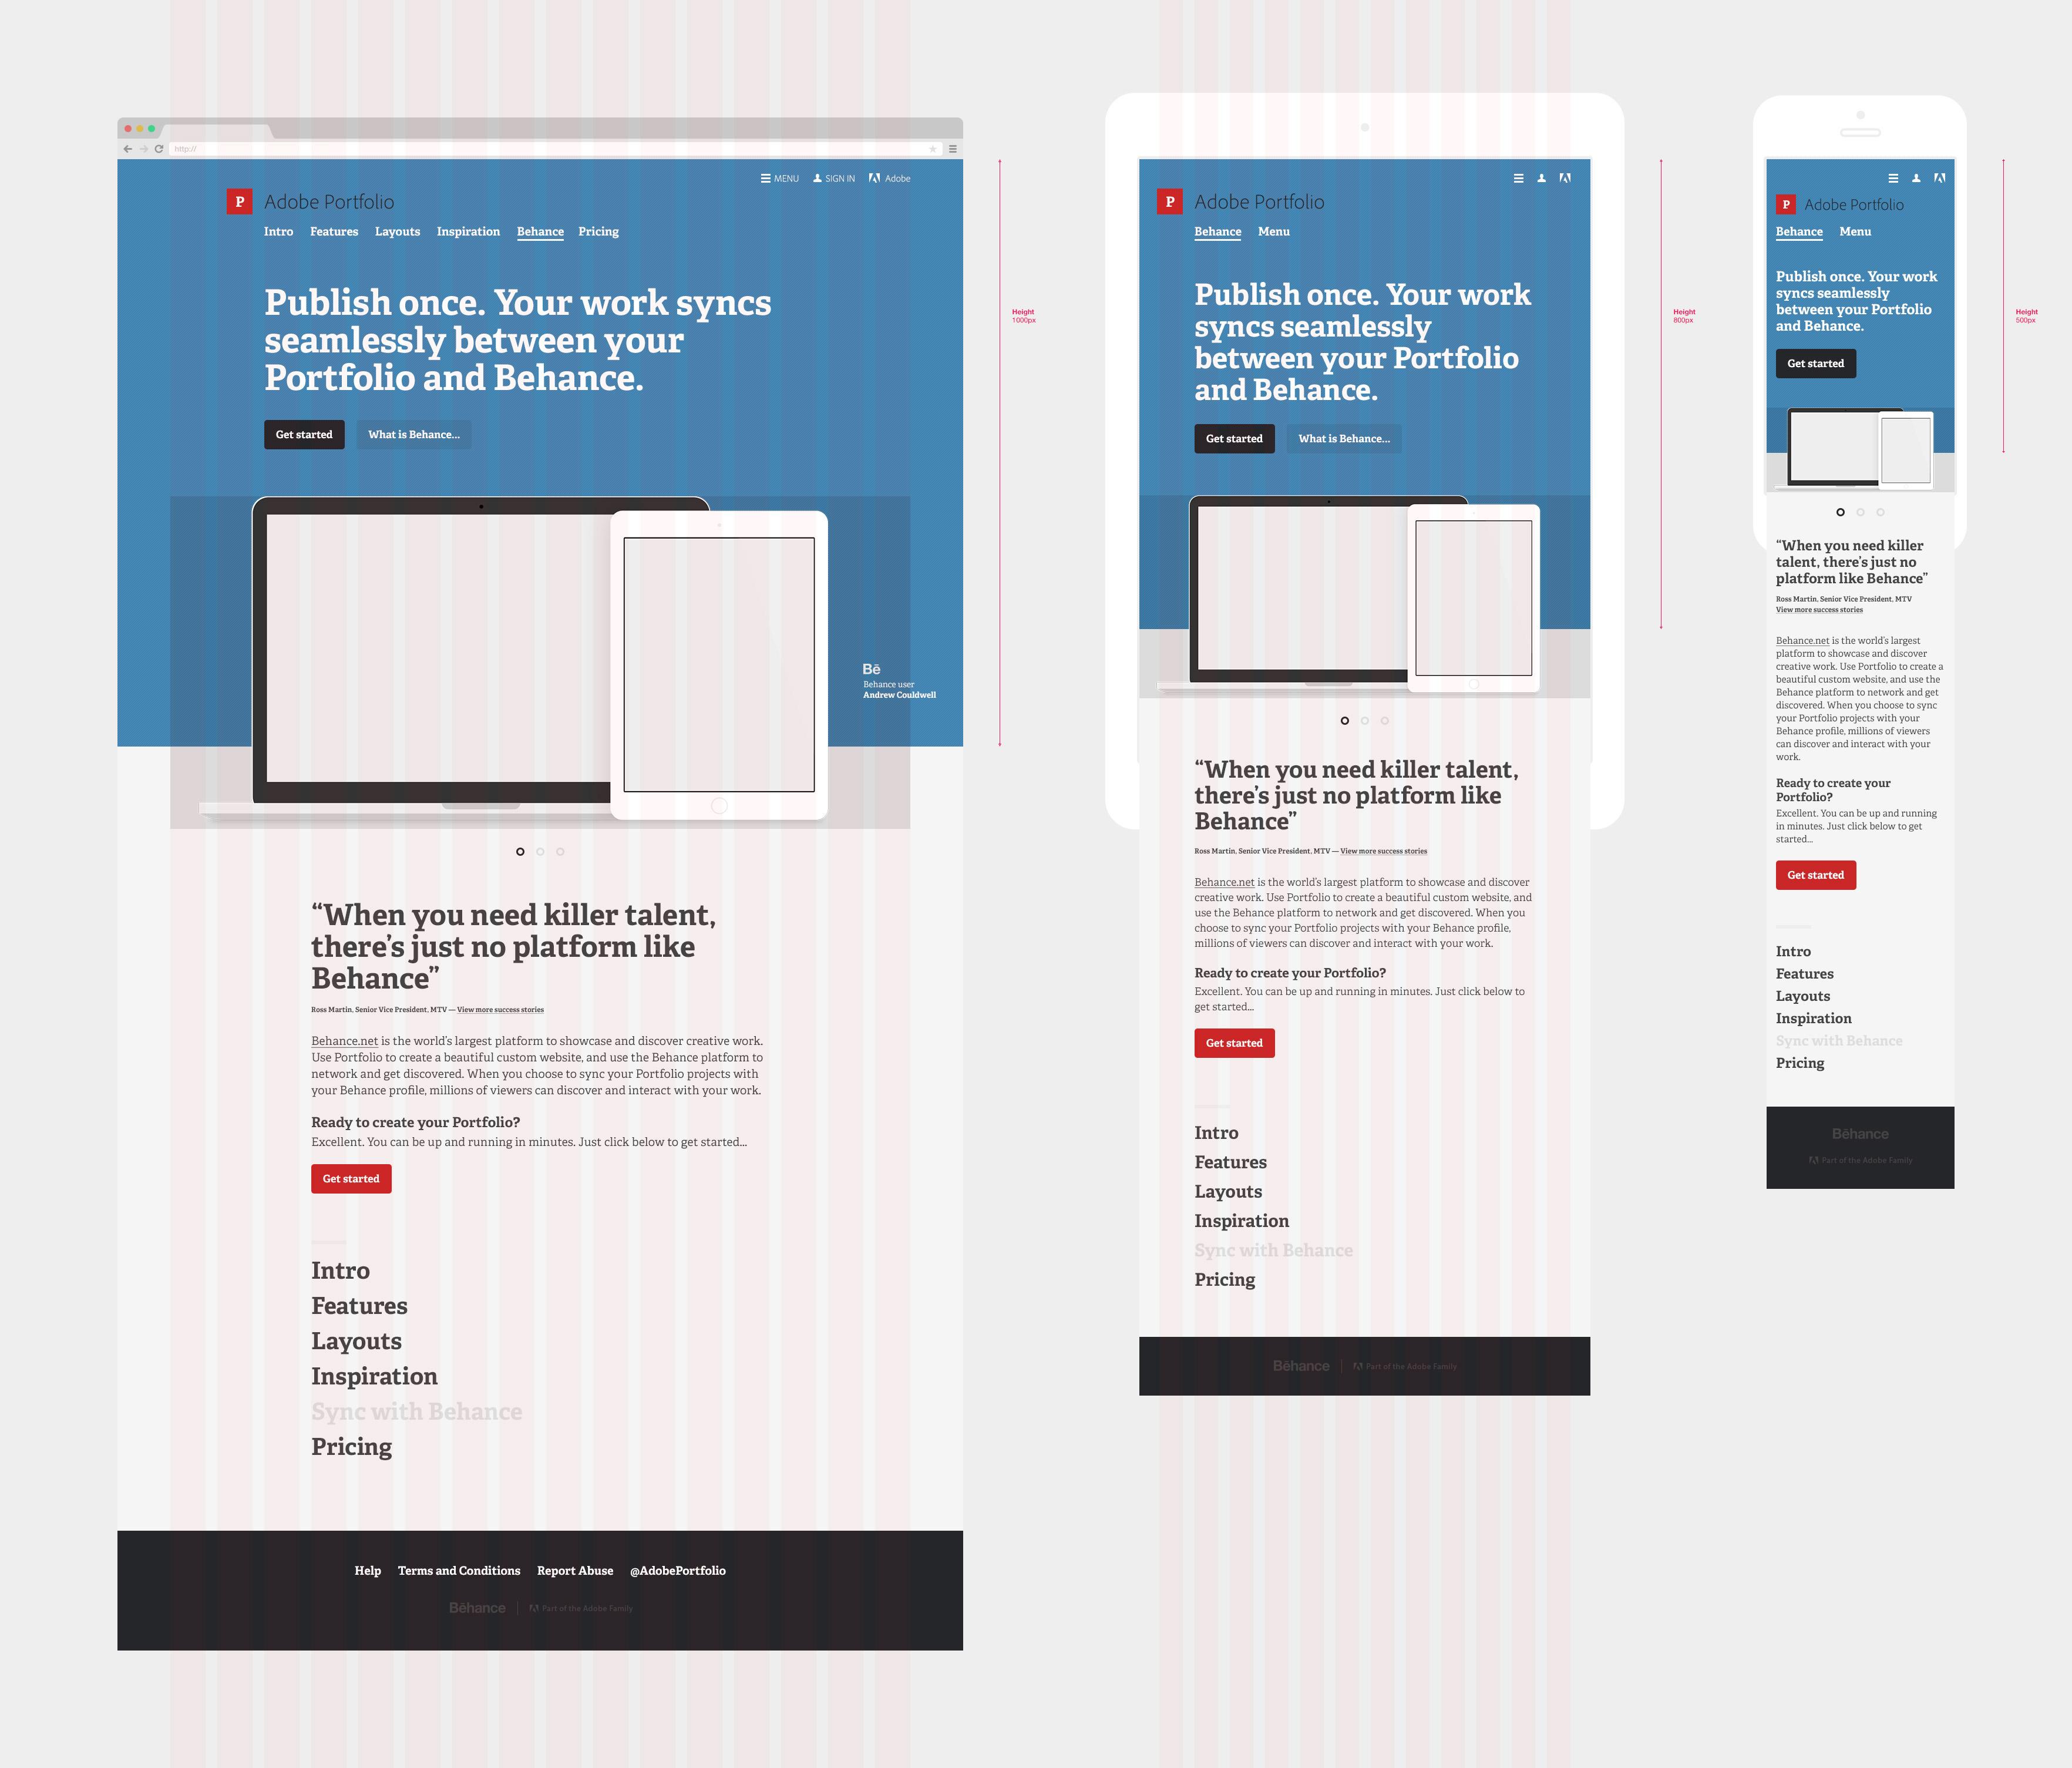 Engaging Adobe Portfolio Marketing Site On Behance Adobe Pdf Portfolio Examples Adobe Spark Portfolio Examples dpreview Adobe Portfolio Examples